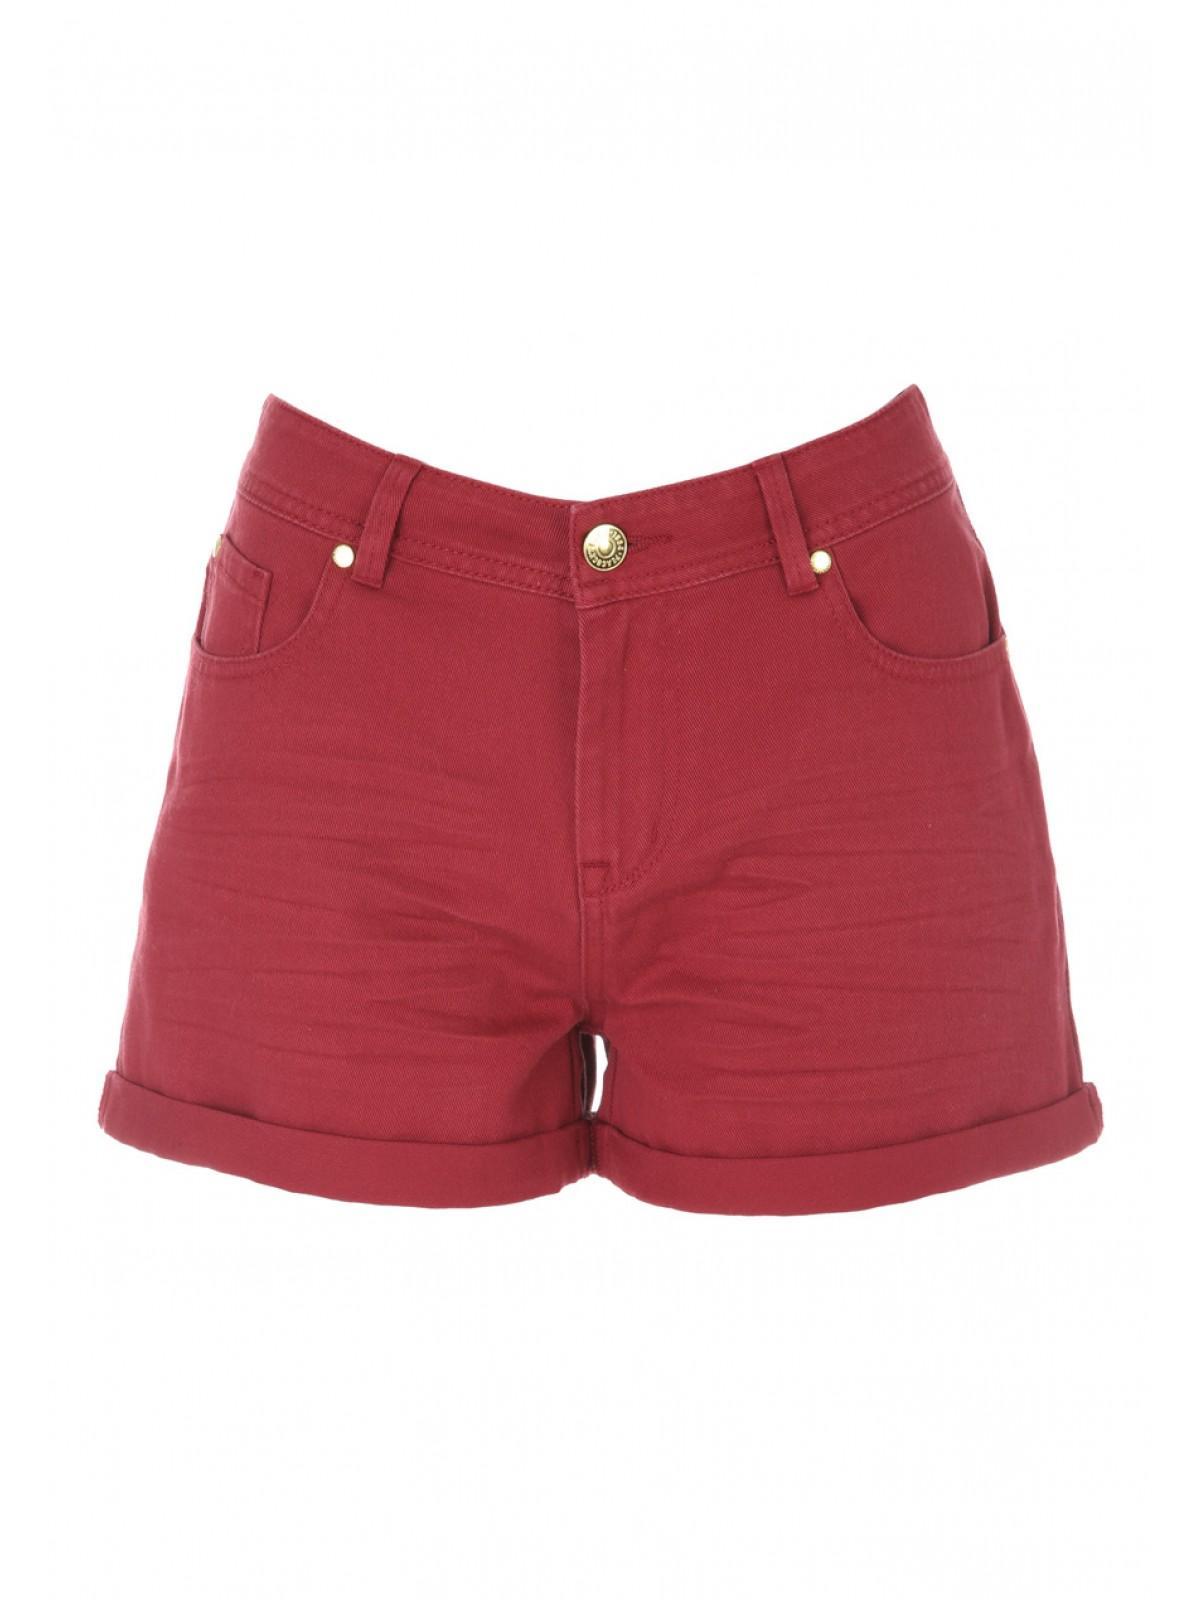 Womens Red Denim Shorts | Peacocks